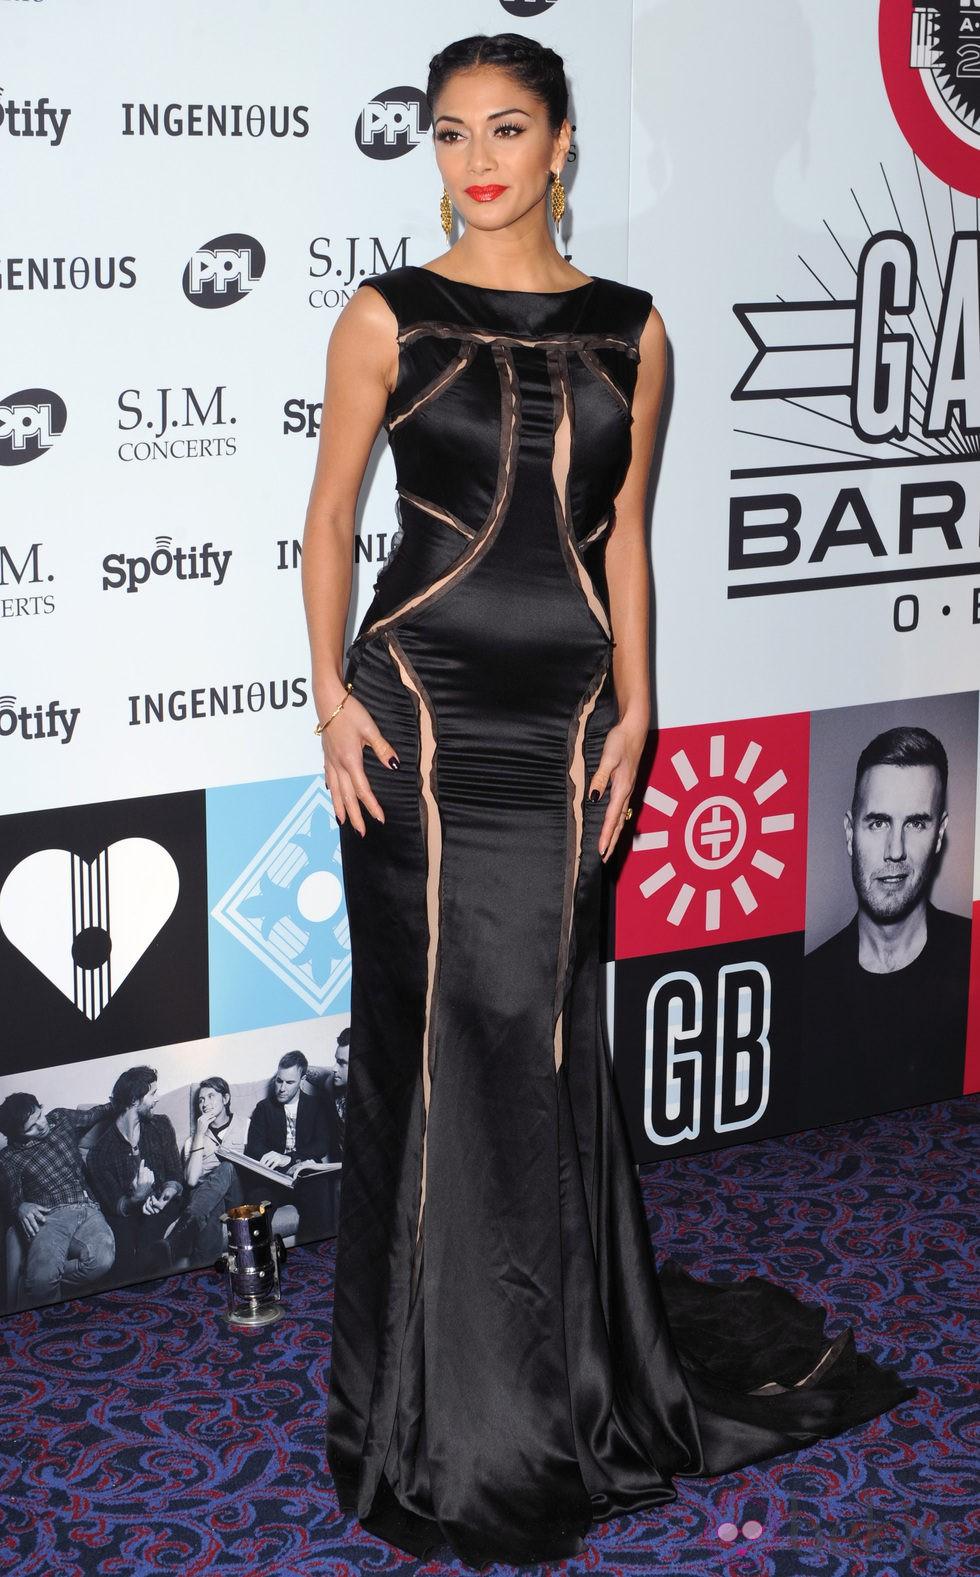 Nicole Scherzinger en la gala Music Industry Trusts Awards 2012